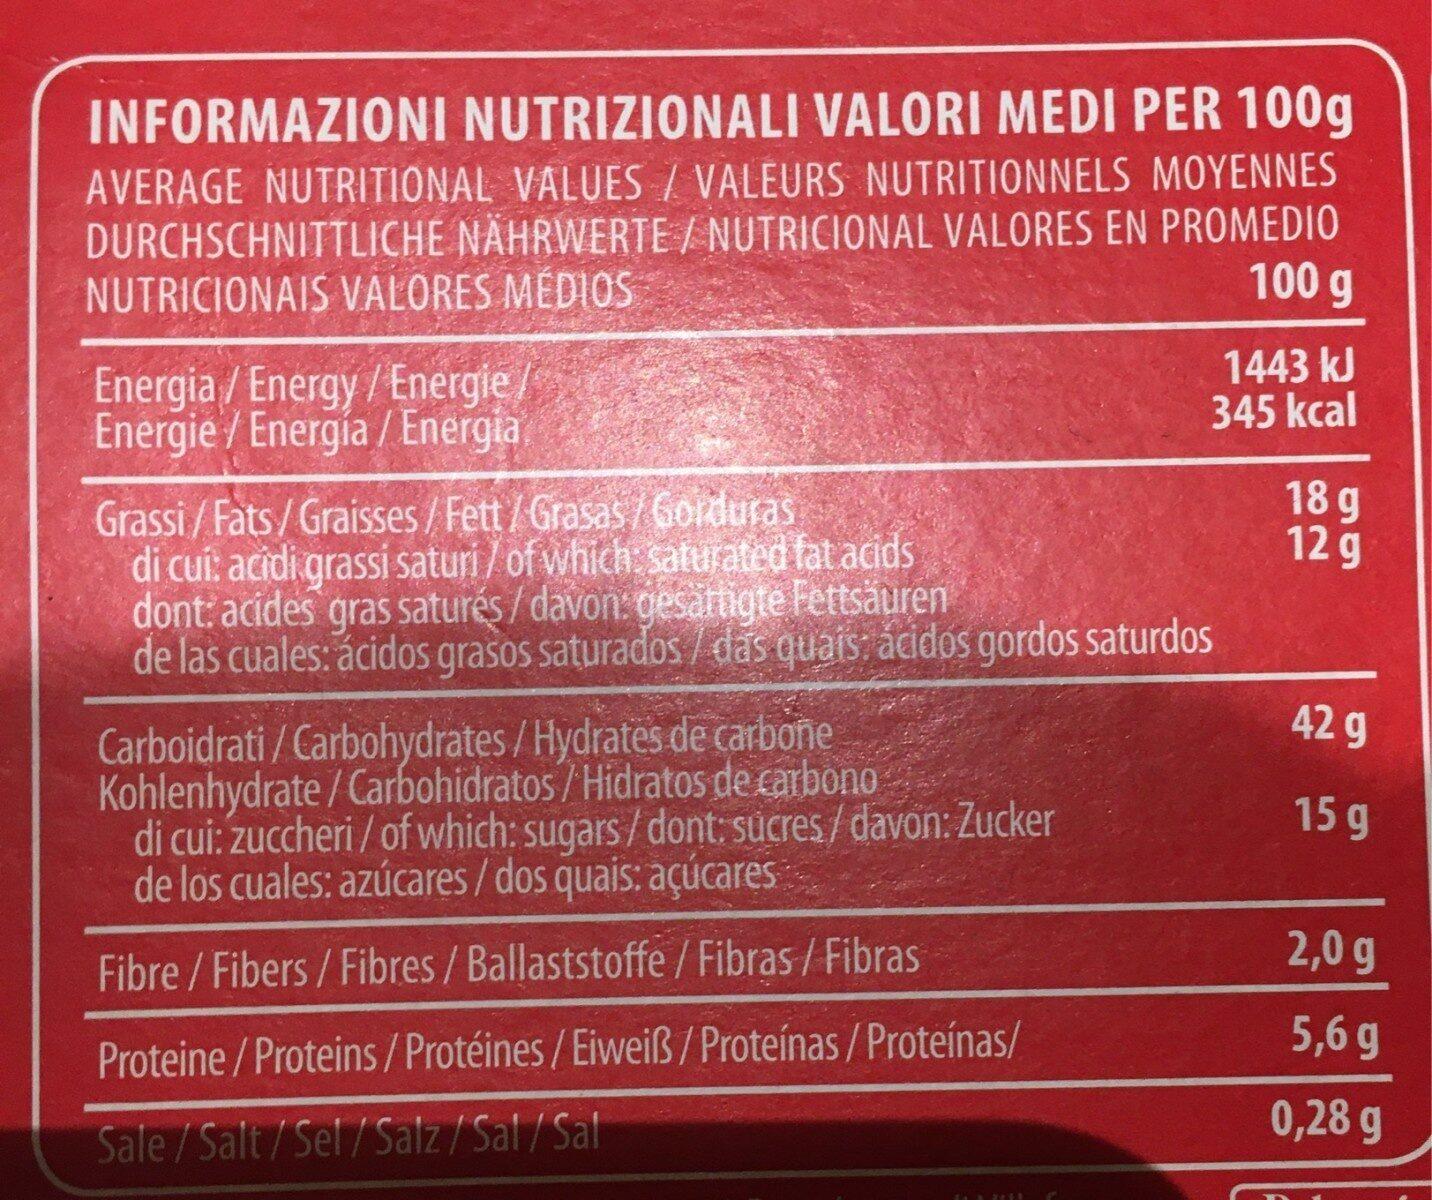 Pandoro di verona sanza glutine - Nutrition facts - fr